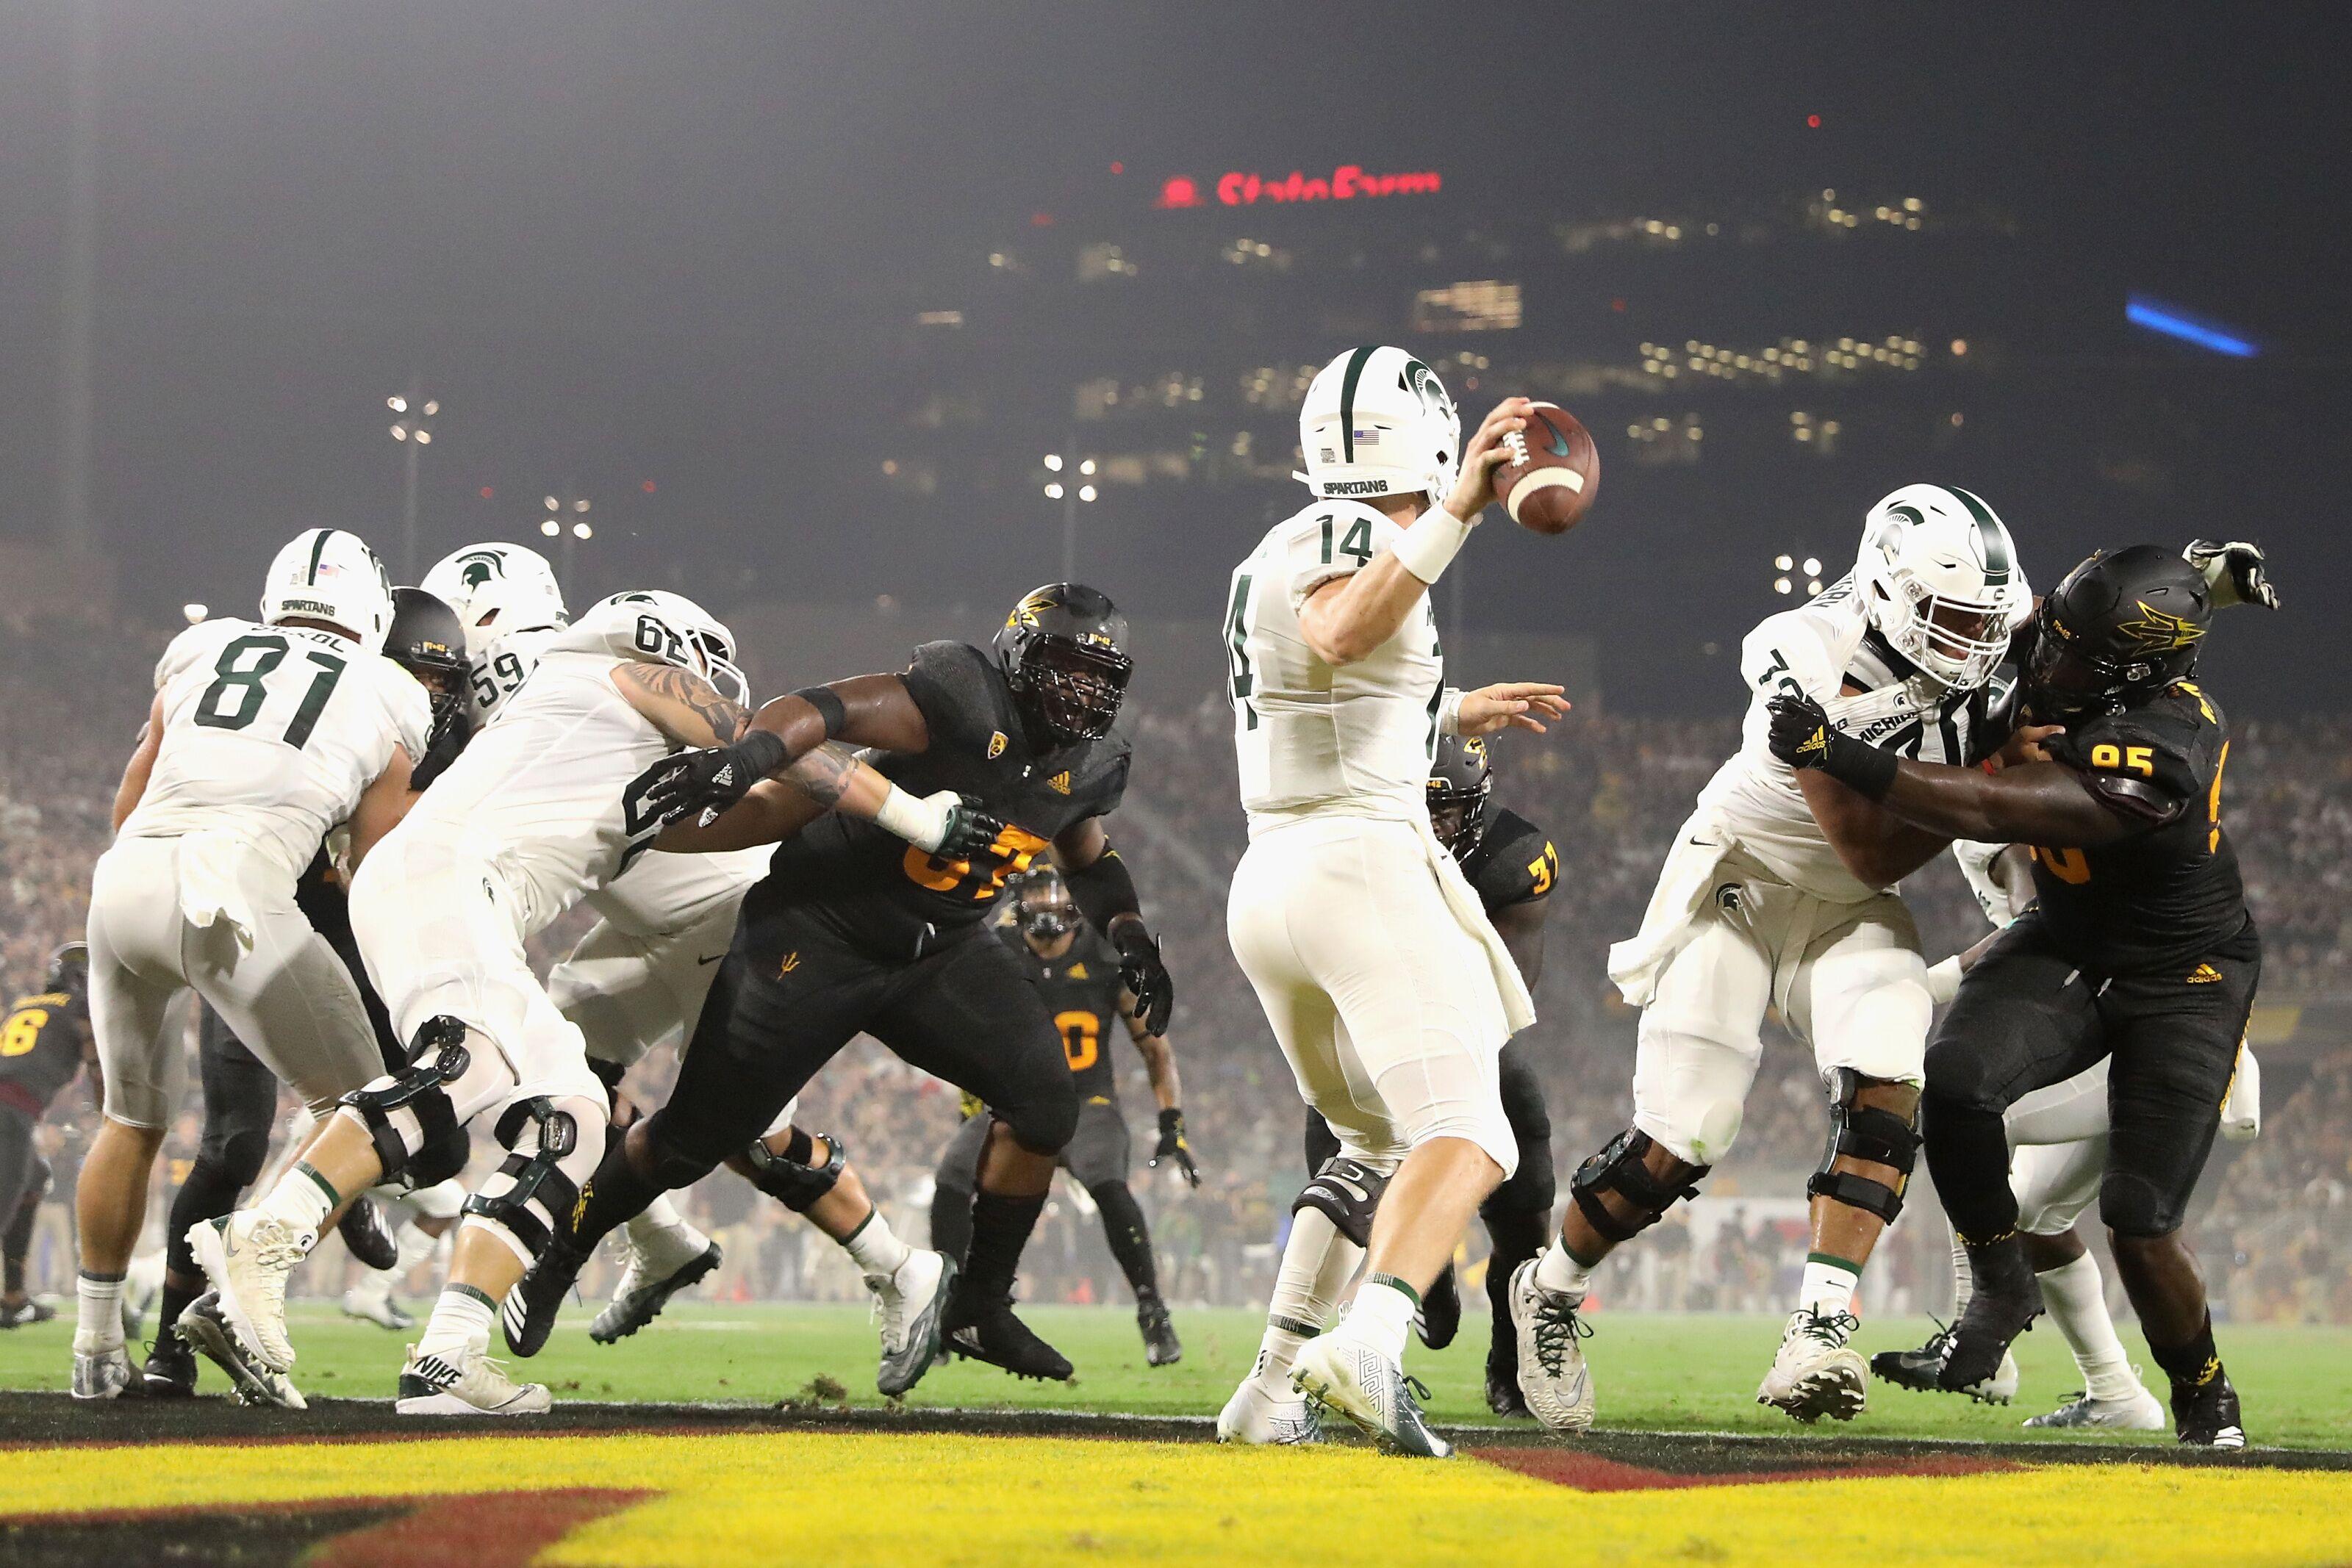 Michigan State Football: Spartans seek revenge vs  Northwestern